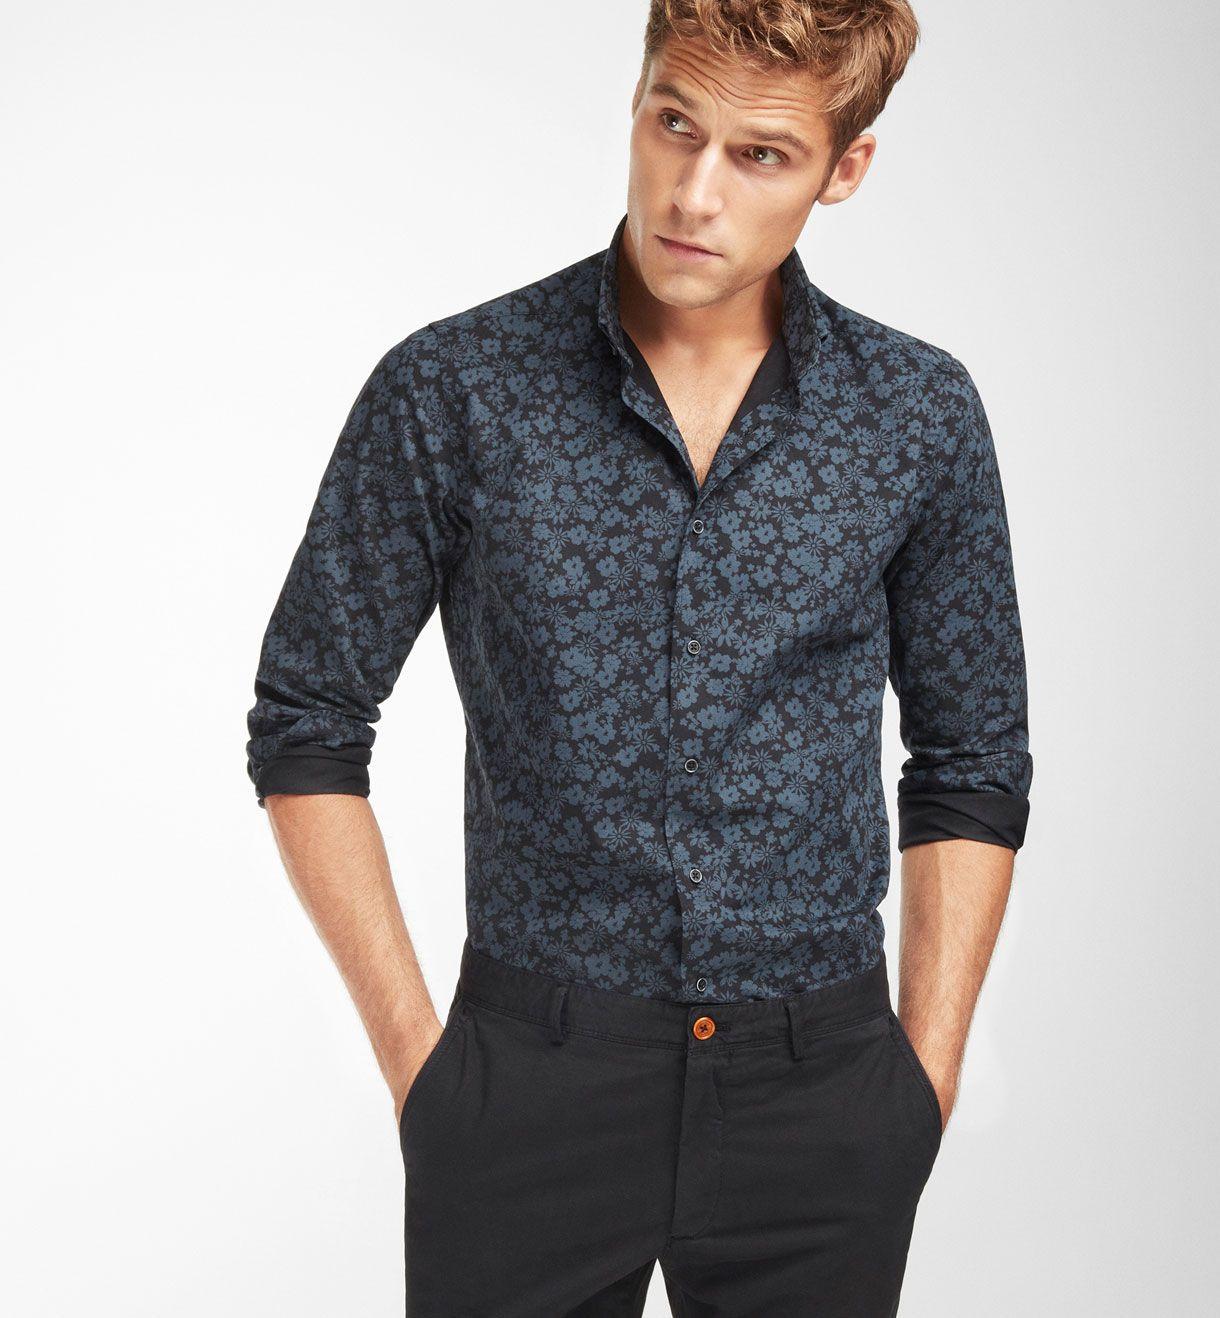 SLIM FIT FLORAL PRINT BLACK SHIRT ,Casual shirts - MEN - Massimo ...